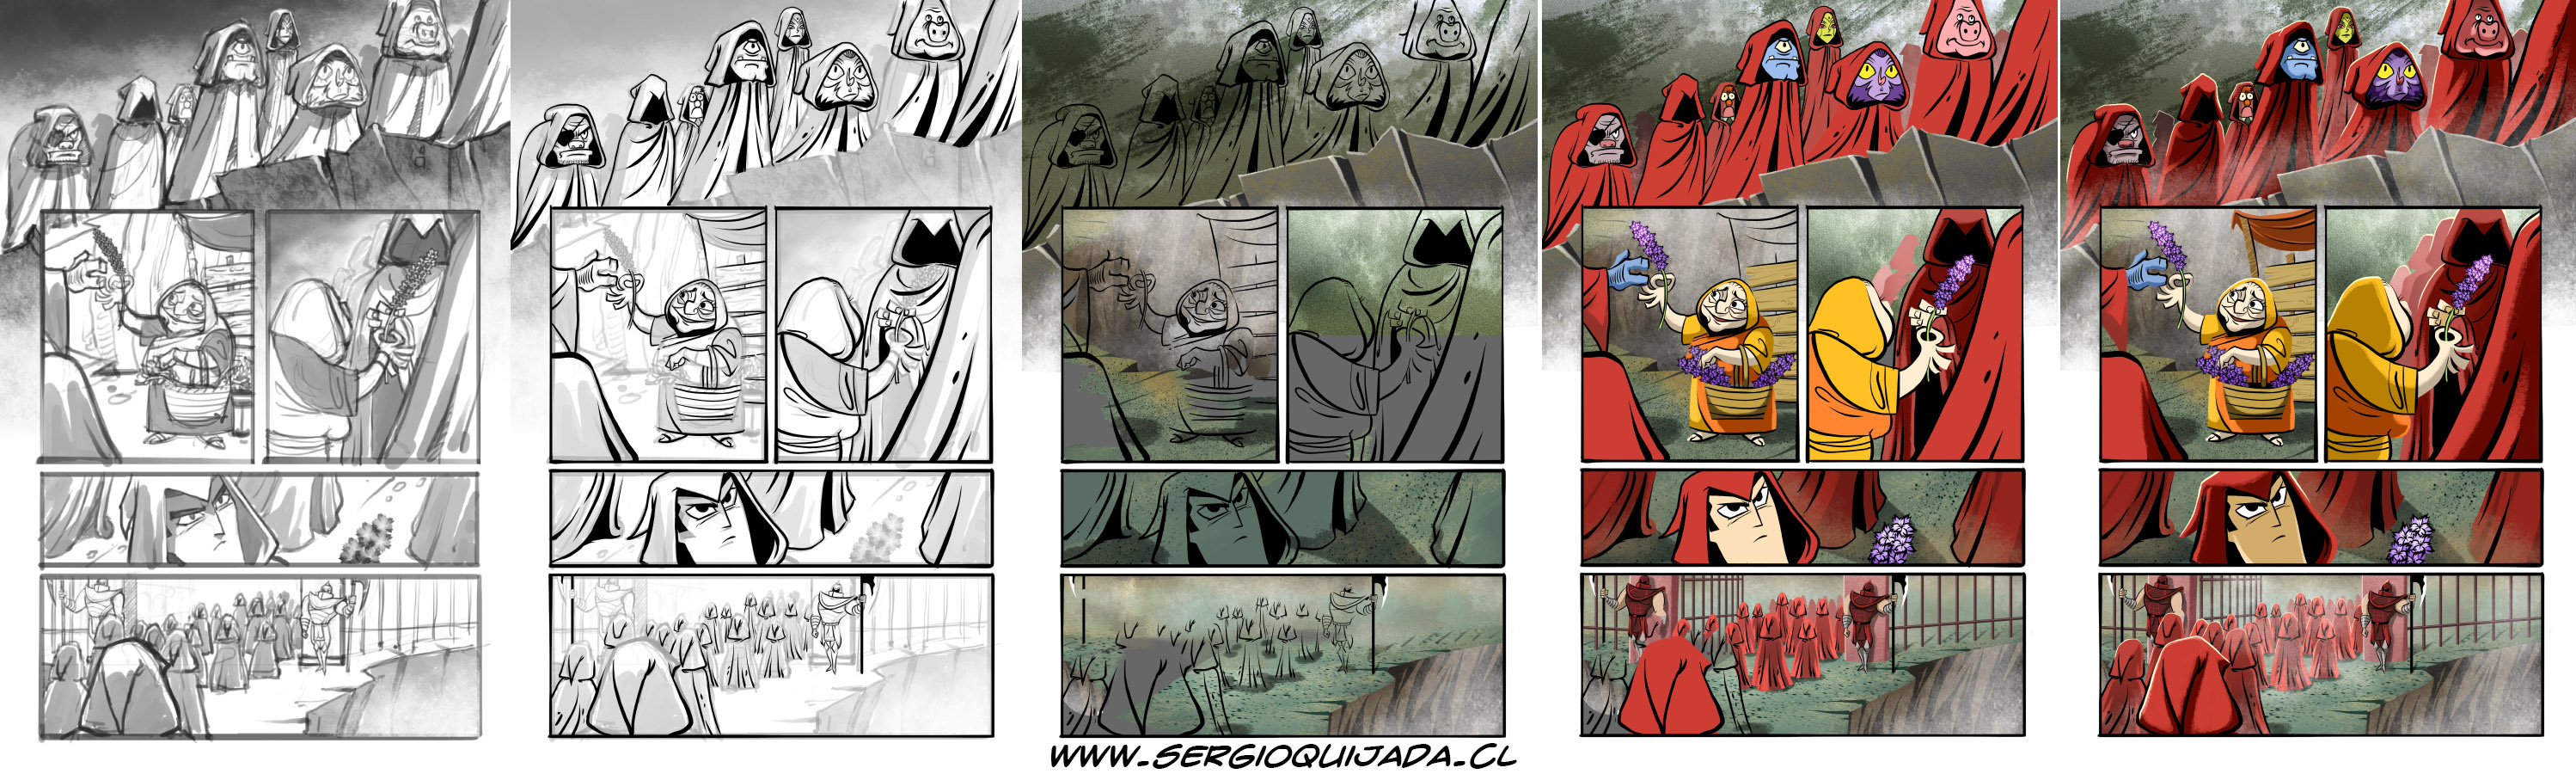 - Samurai Jack 16 - Page process + FB contest by sergio-quijada